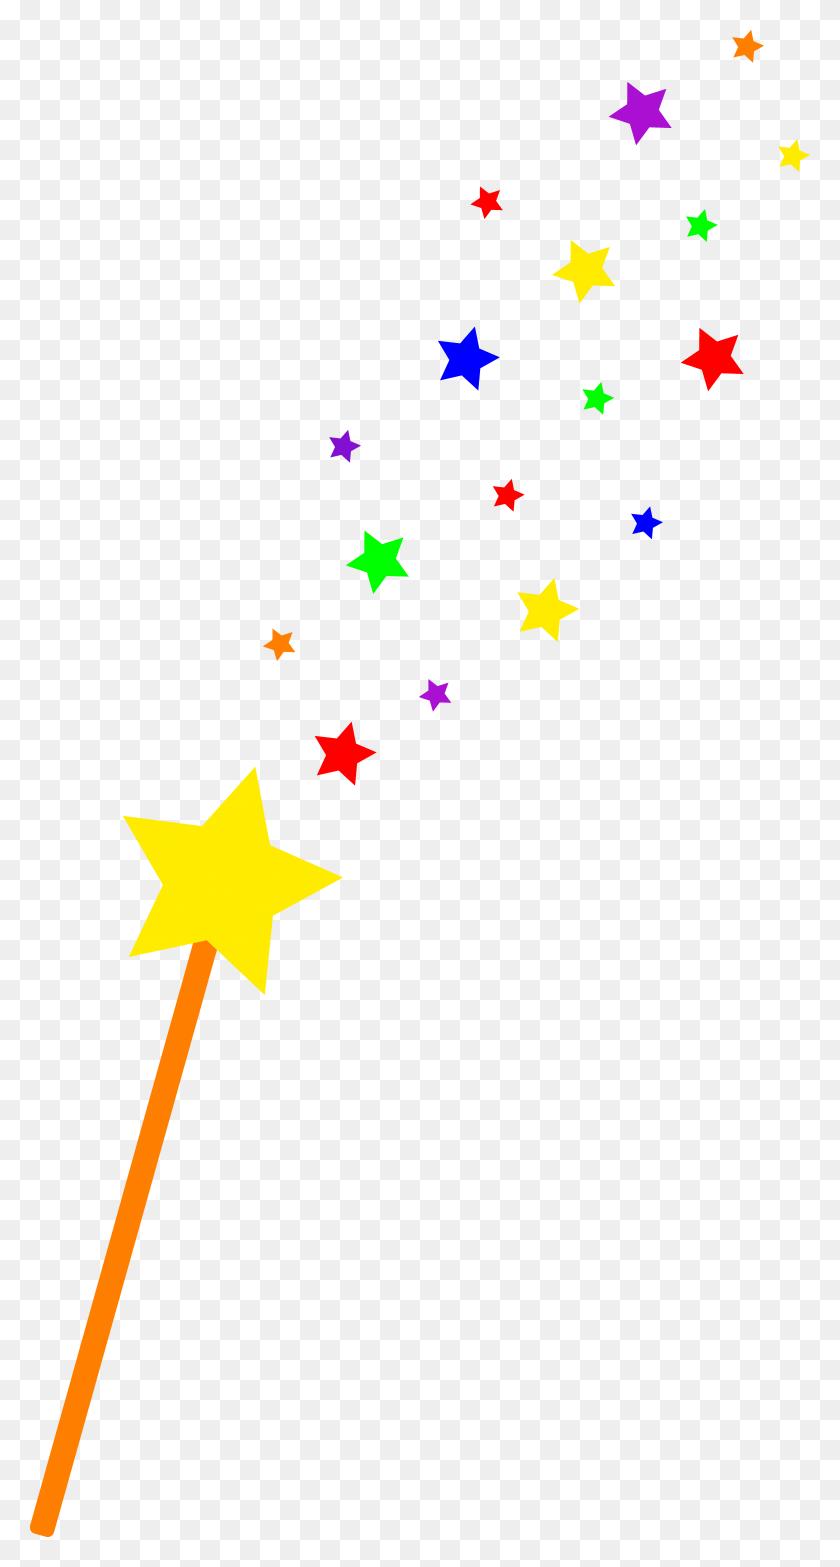 Shining Star Clip Art - Shining Star Clipart